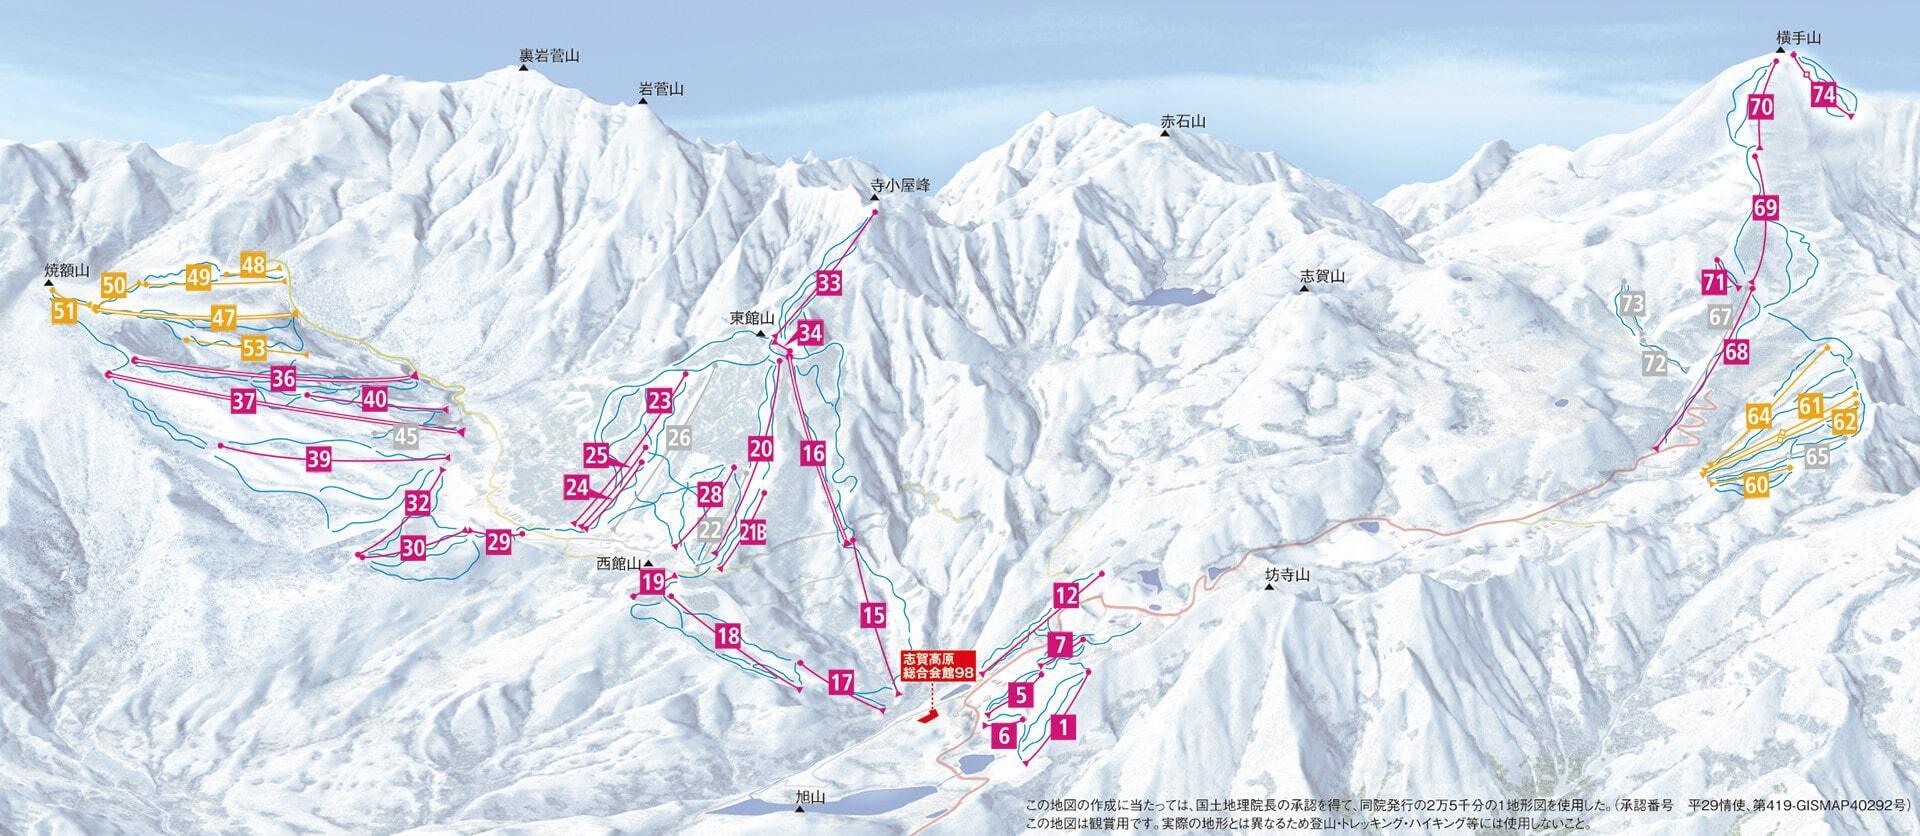 Shiga KogenYakebitaiyama Piste Map Trail Map